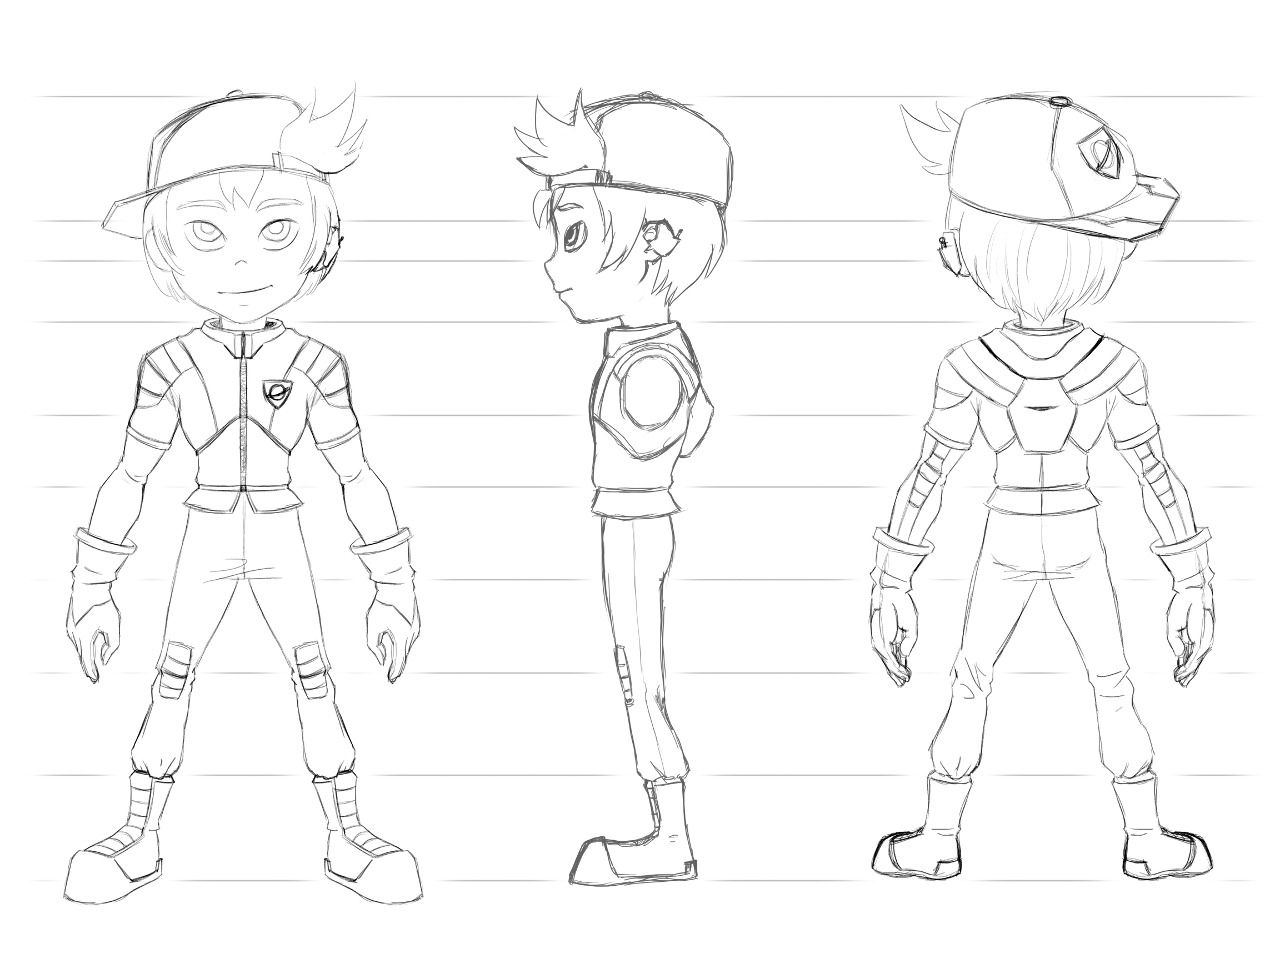 Cartoon Character Modeling Blender : Blender character drawing